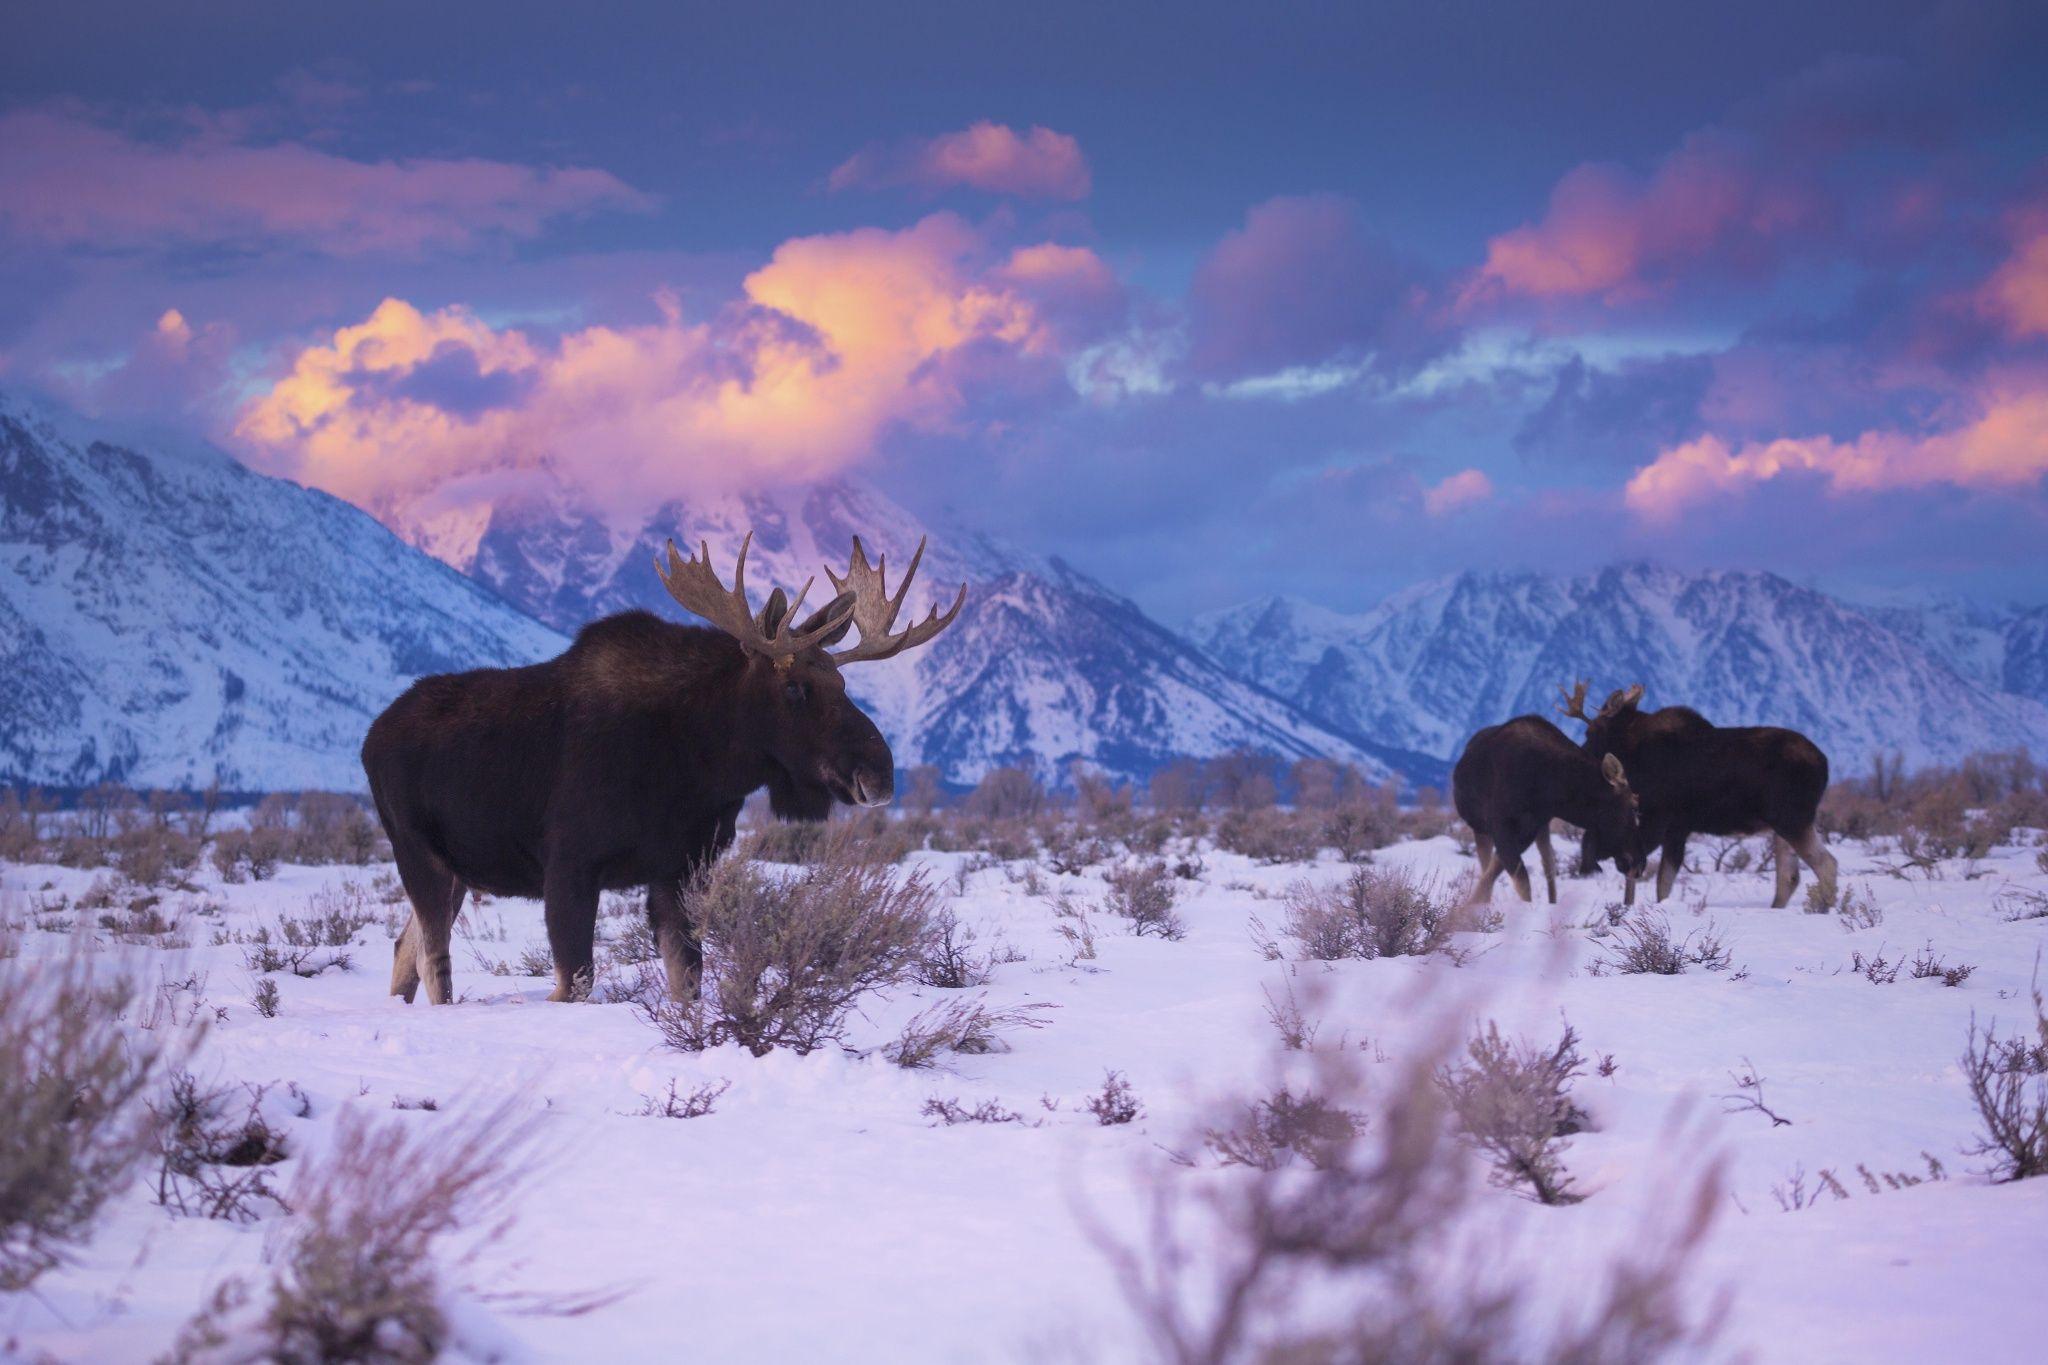 Winter's Vibrance by Chase Dekker on 500px